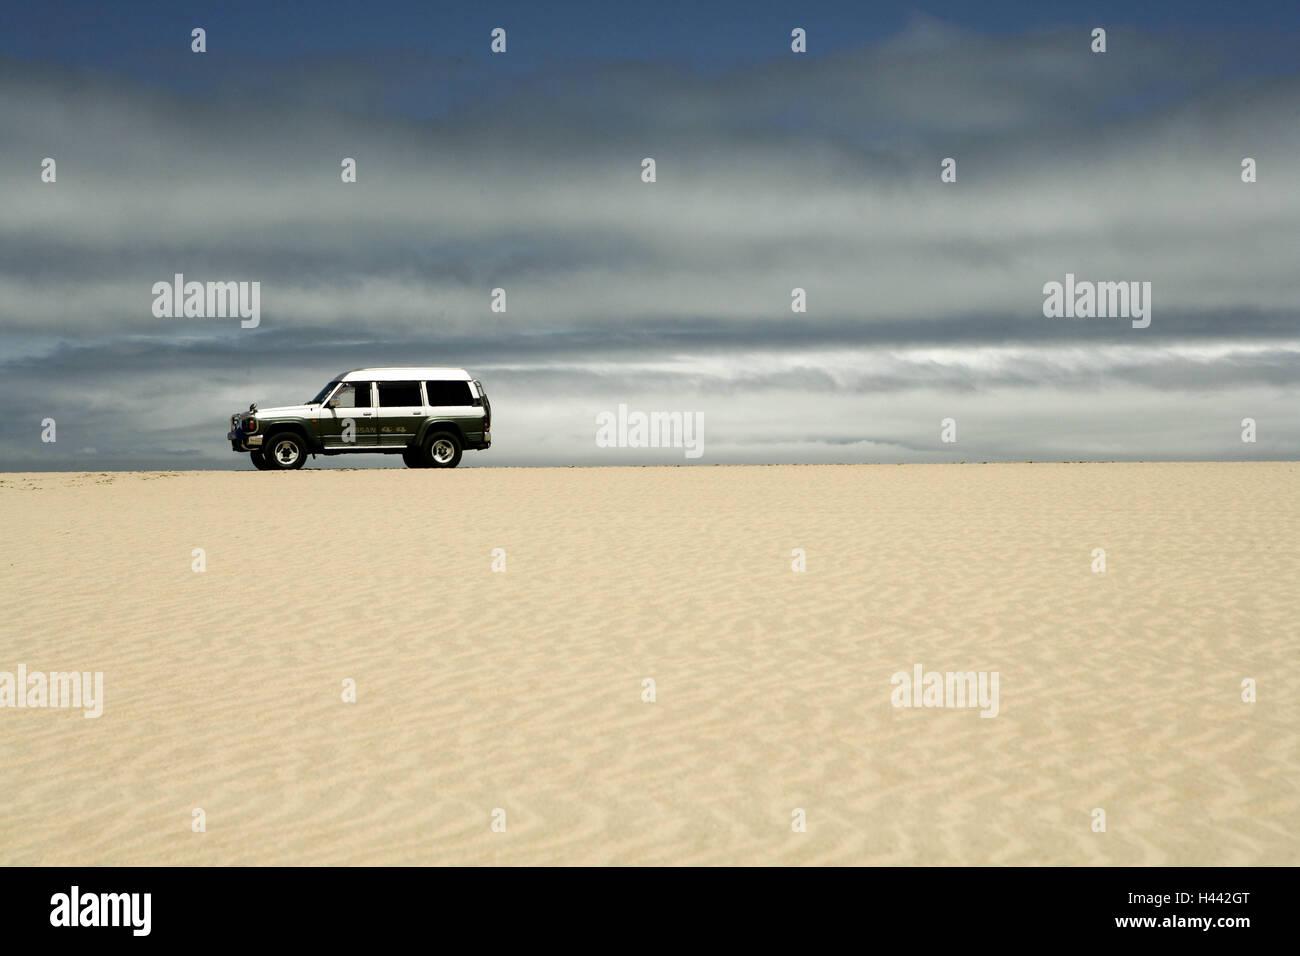 Namibia, Walvis bay, dune 7, offroad car - Stock Image